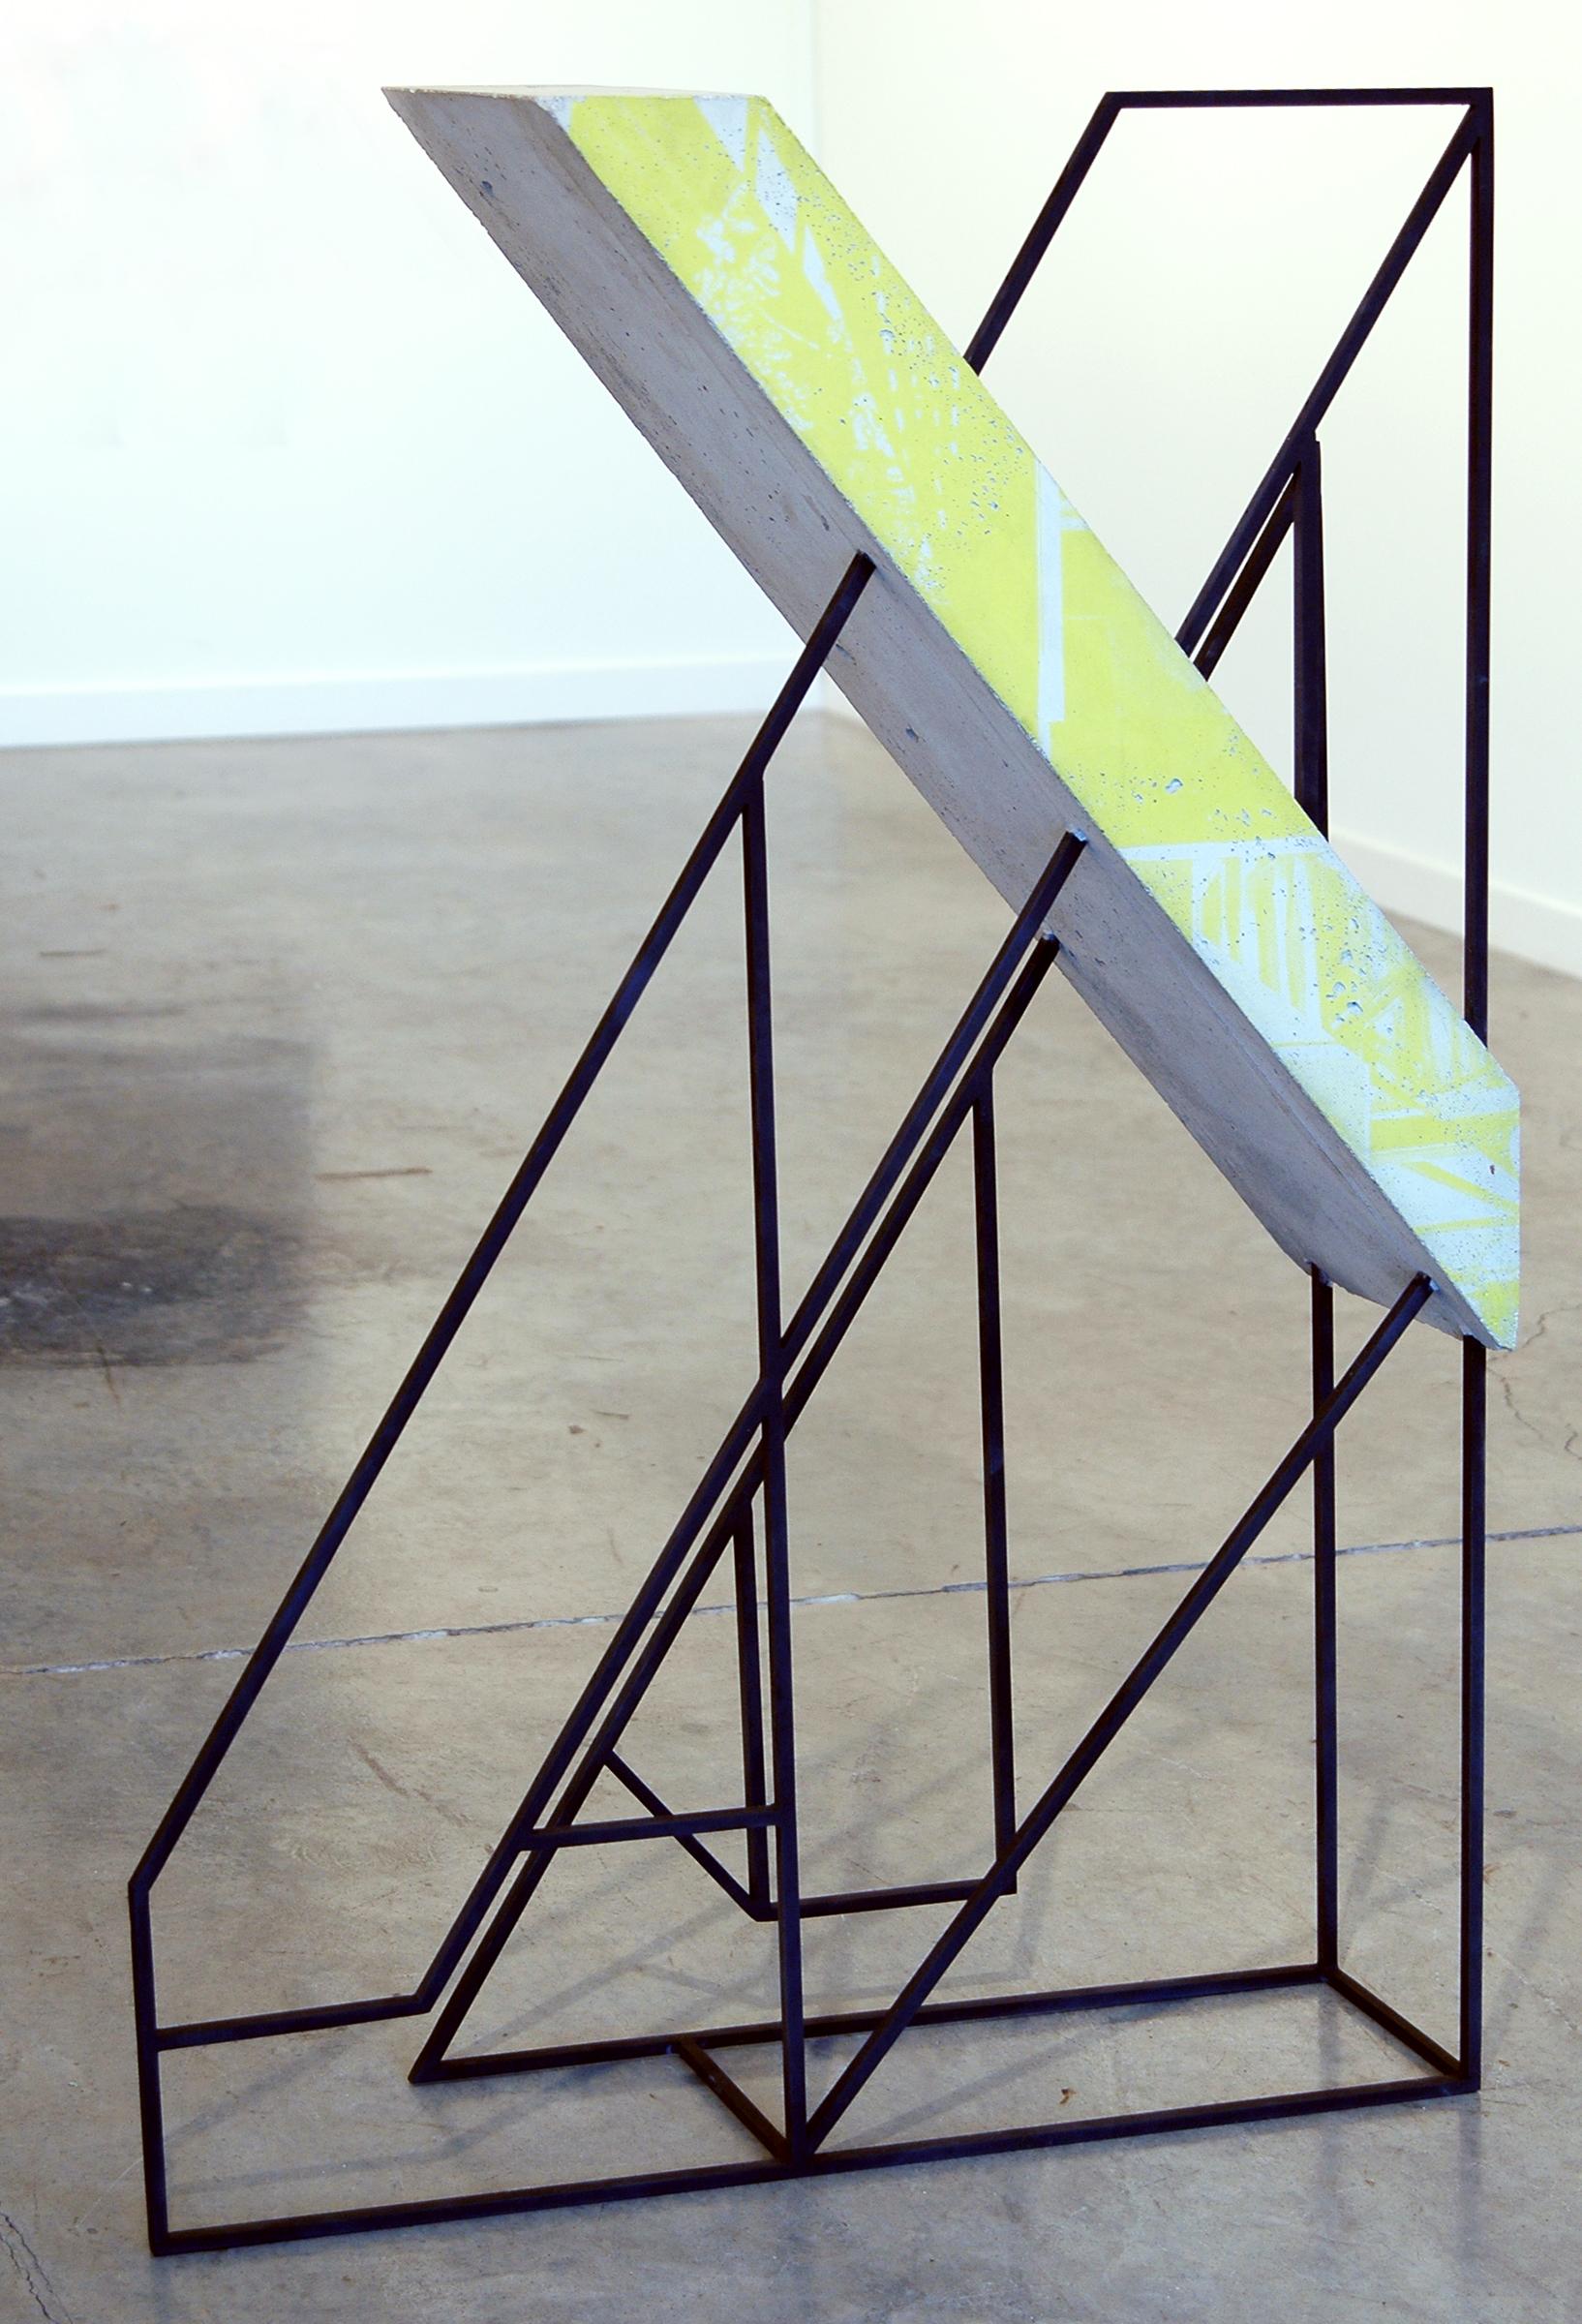 "WITH CINDER BLOCKS WE FLATTEN OUR PHOTOGRAPHS  Jonathan Runcio, Model 3 , steel, primer, concrete and screen-print, 49"" x 33.5"" x 9.5"", 2012"